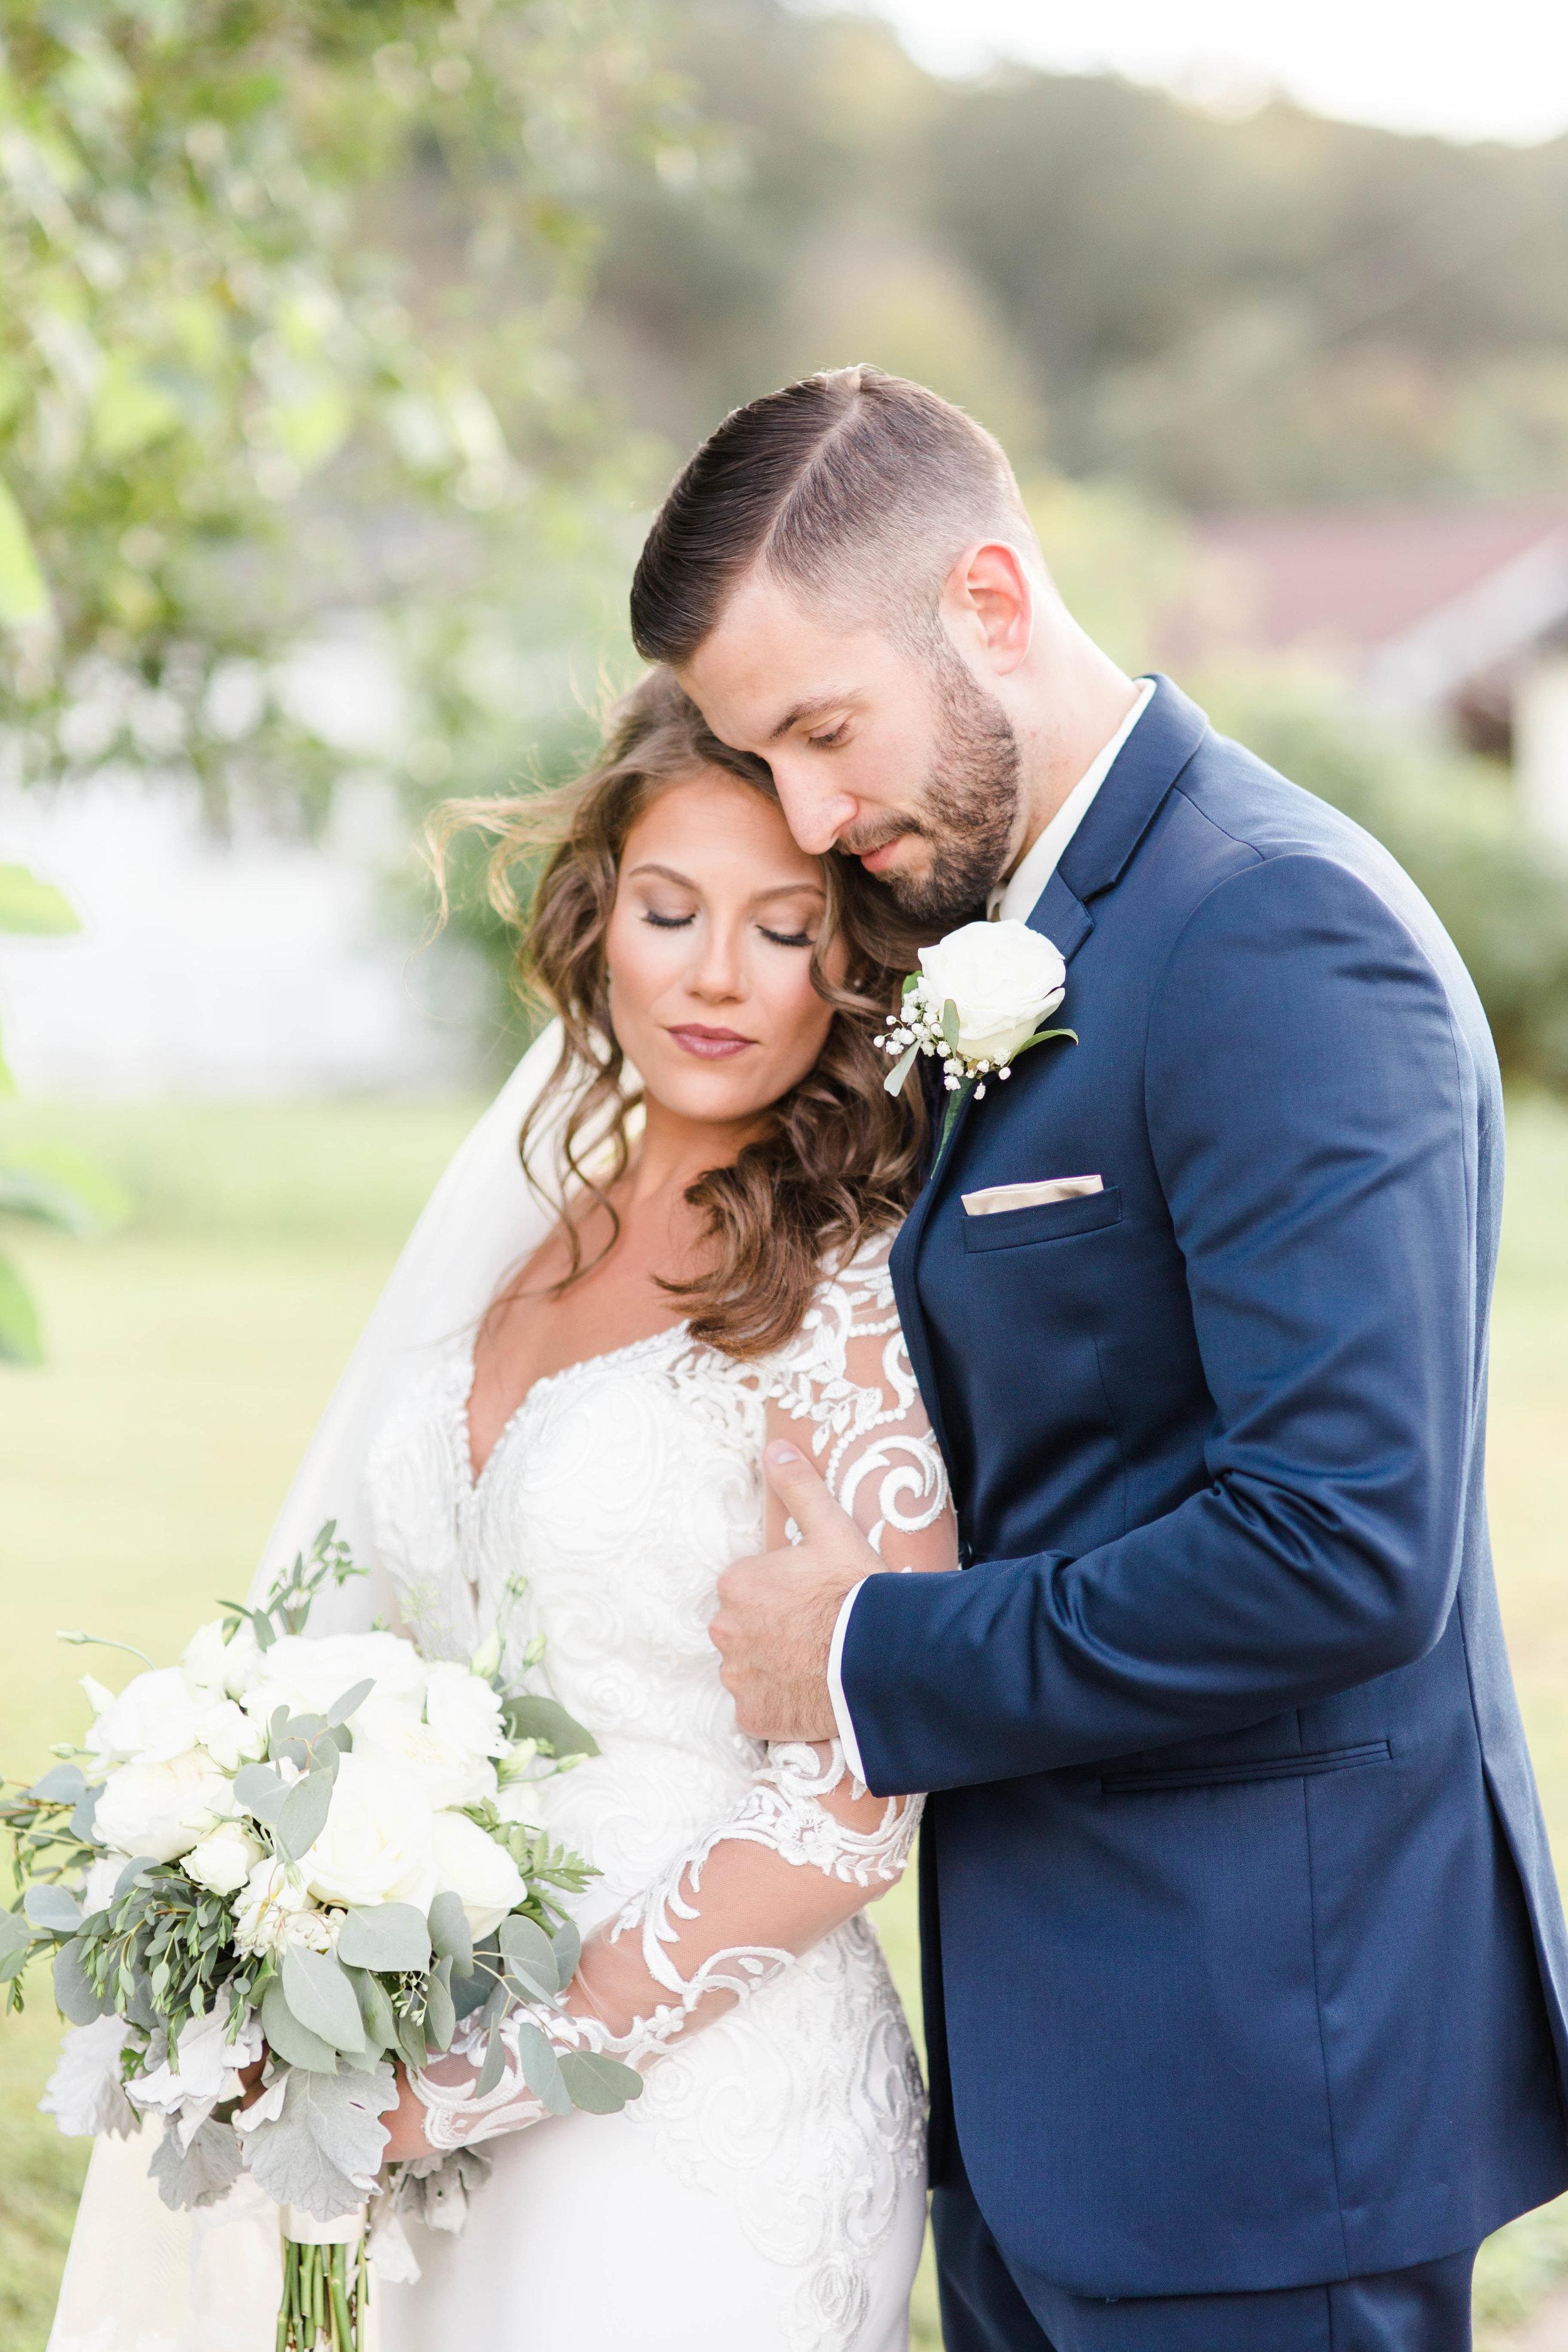 Burns_Wedding_the_old_post_office_Kara_Blakeman_Photography_2018_Huntington_West_Virginia-5110.jpg